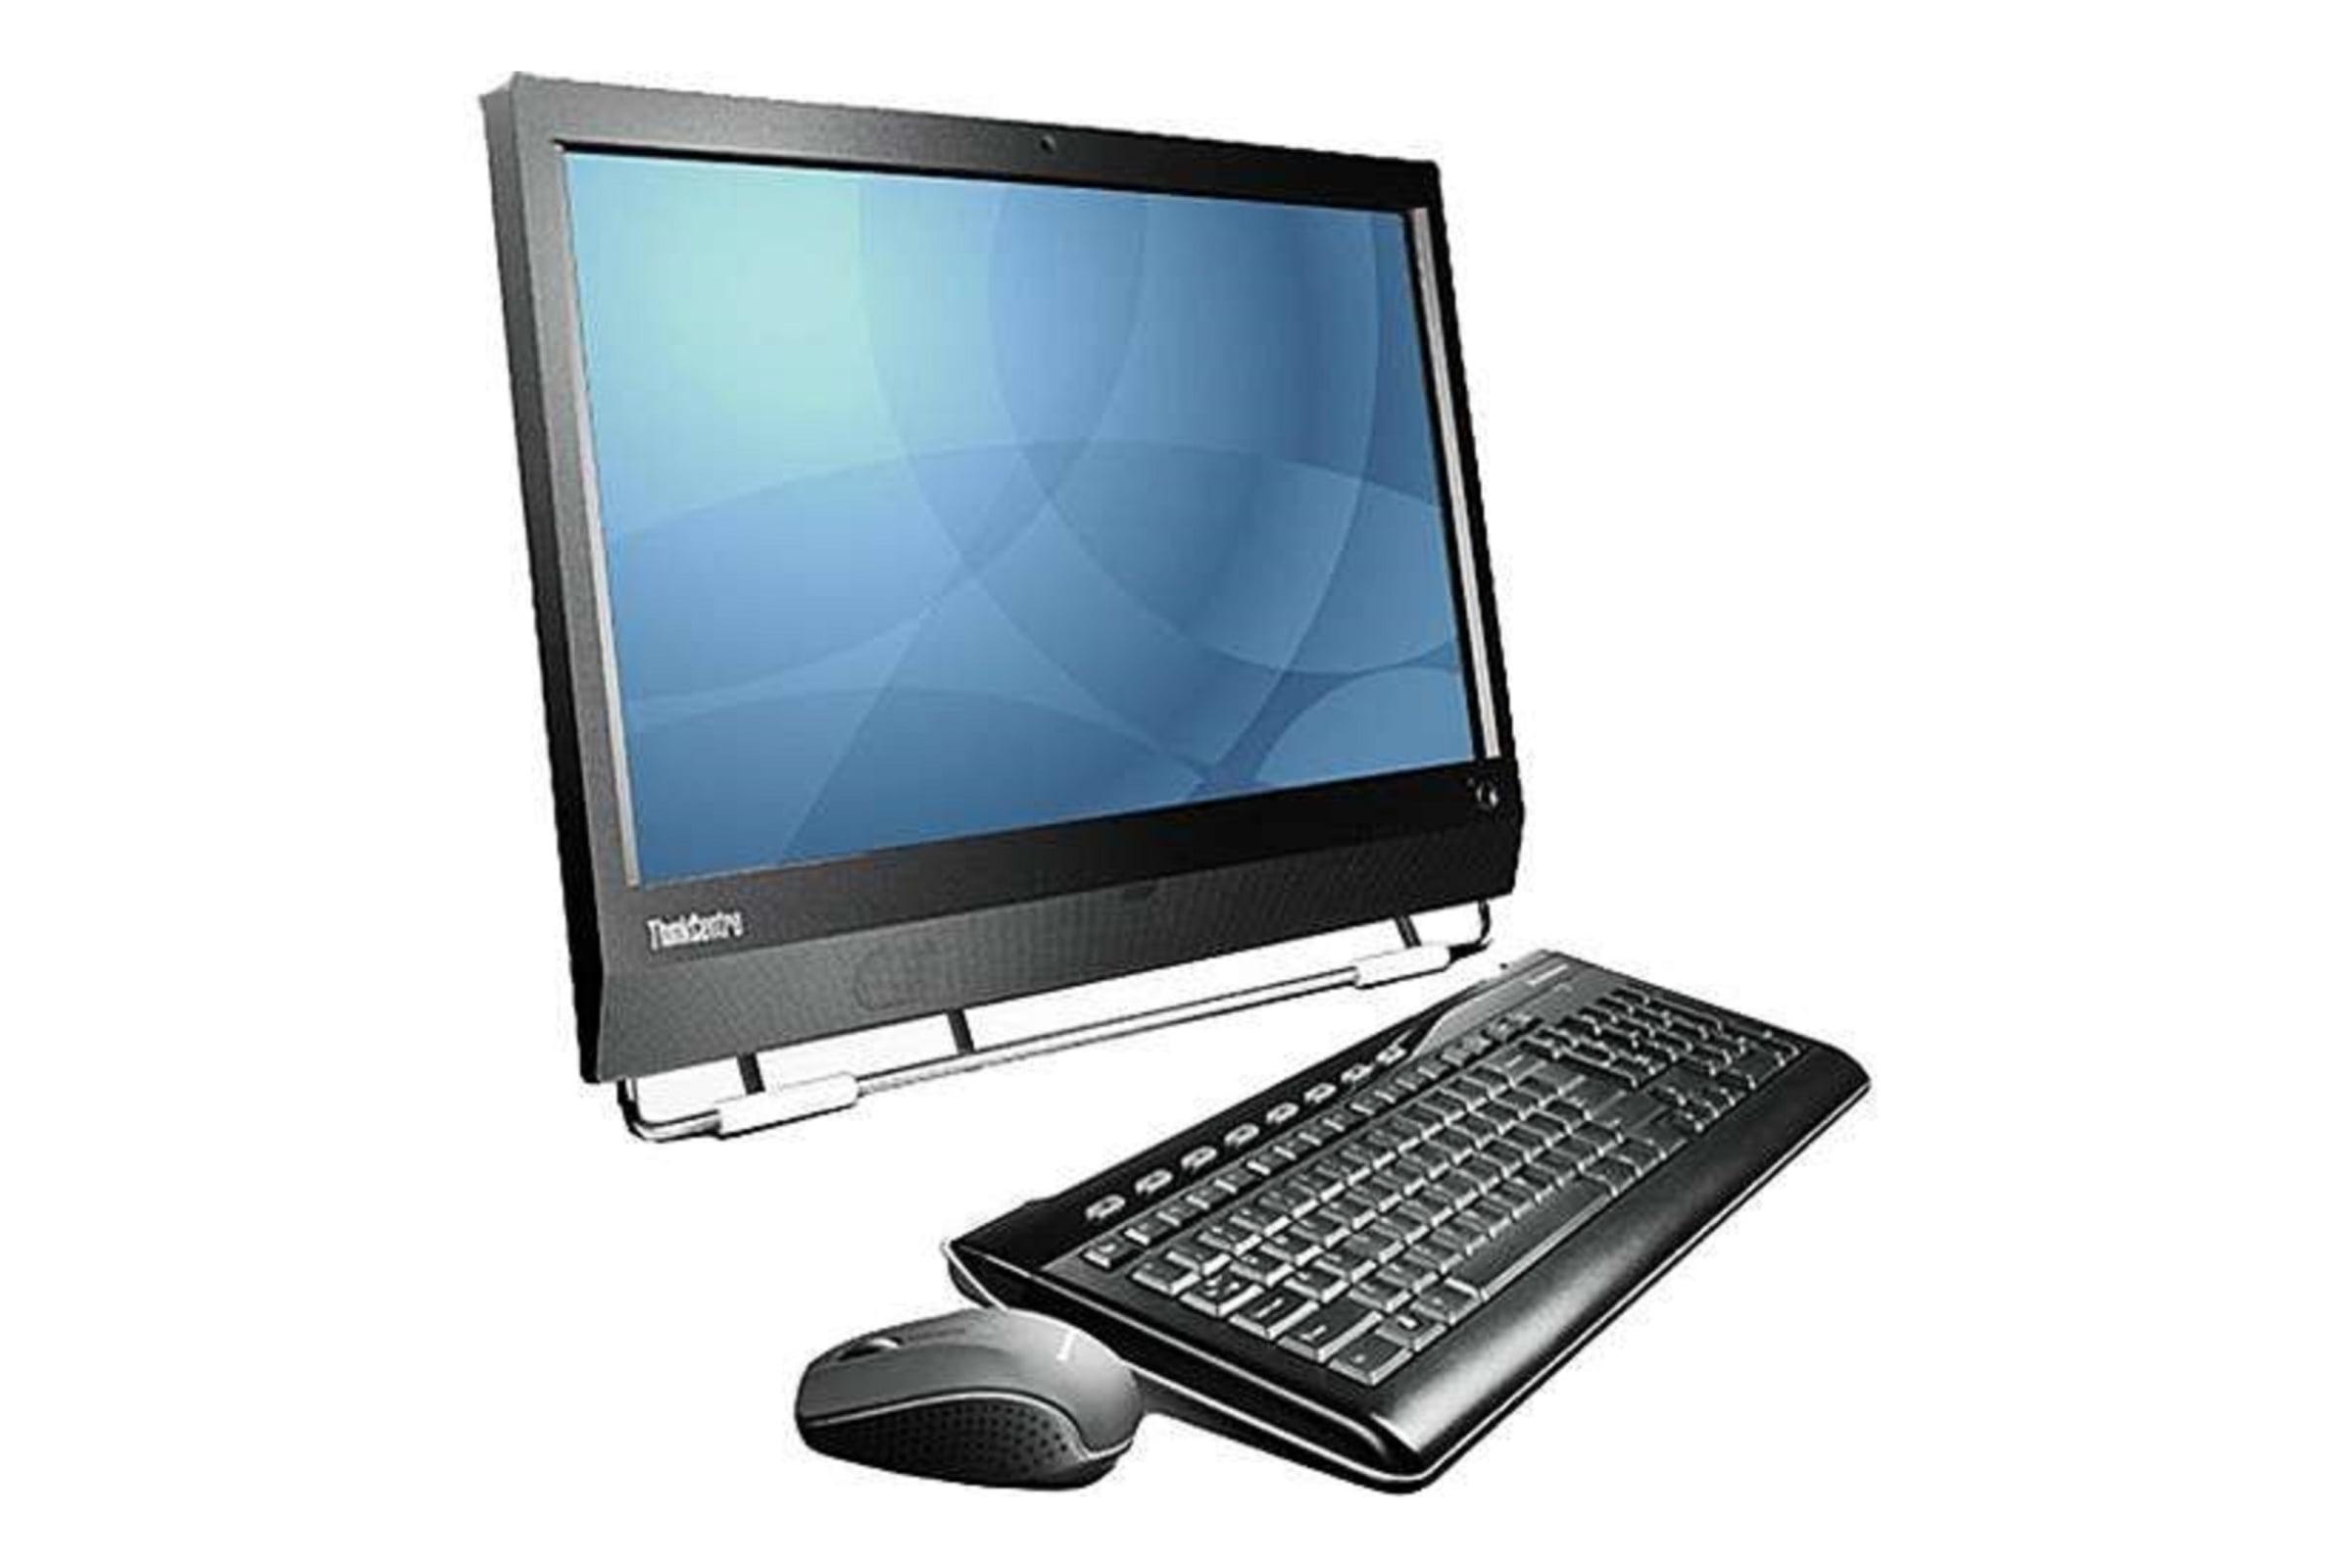 New Driver: Lenovo ThinkCentre M90z Intel